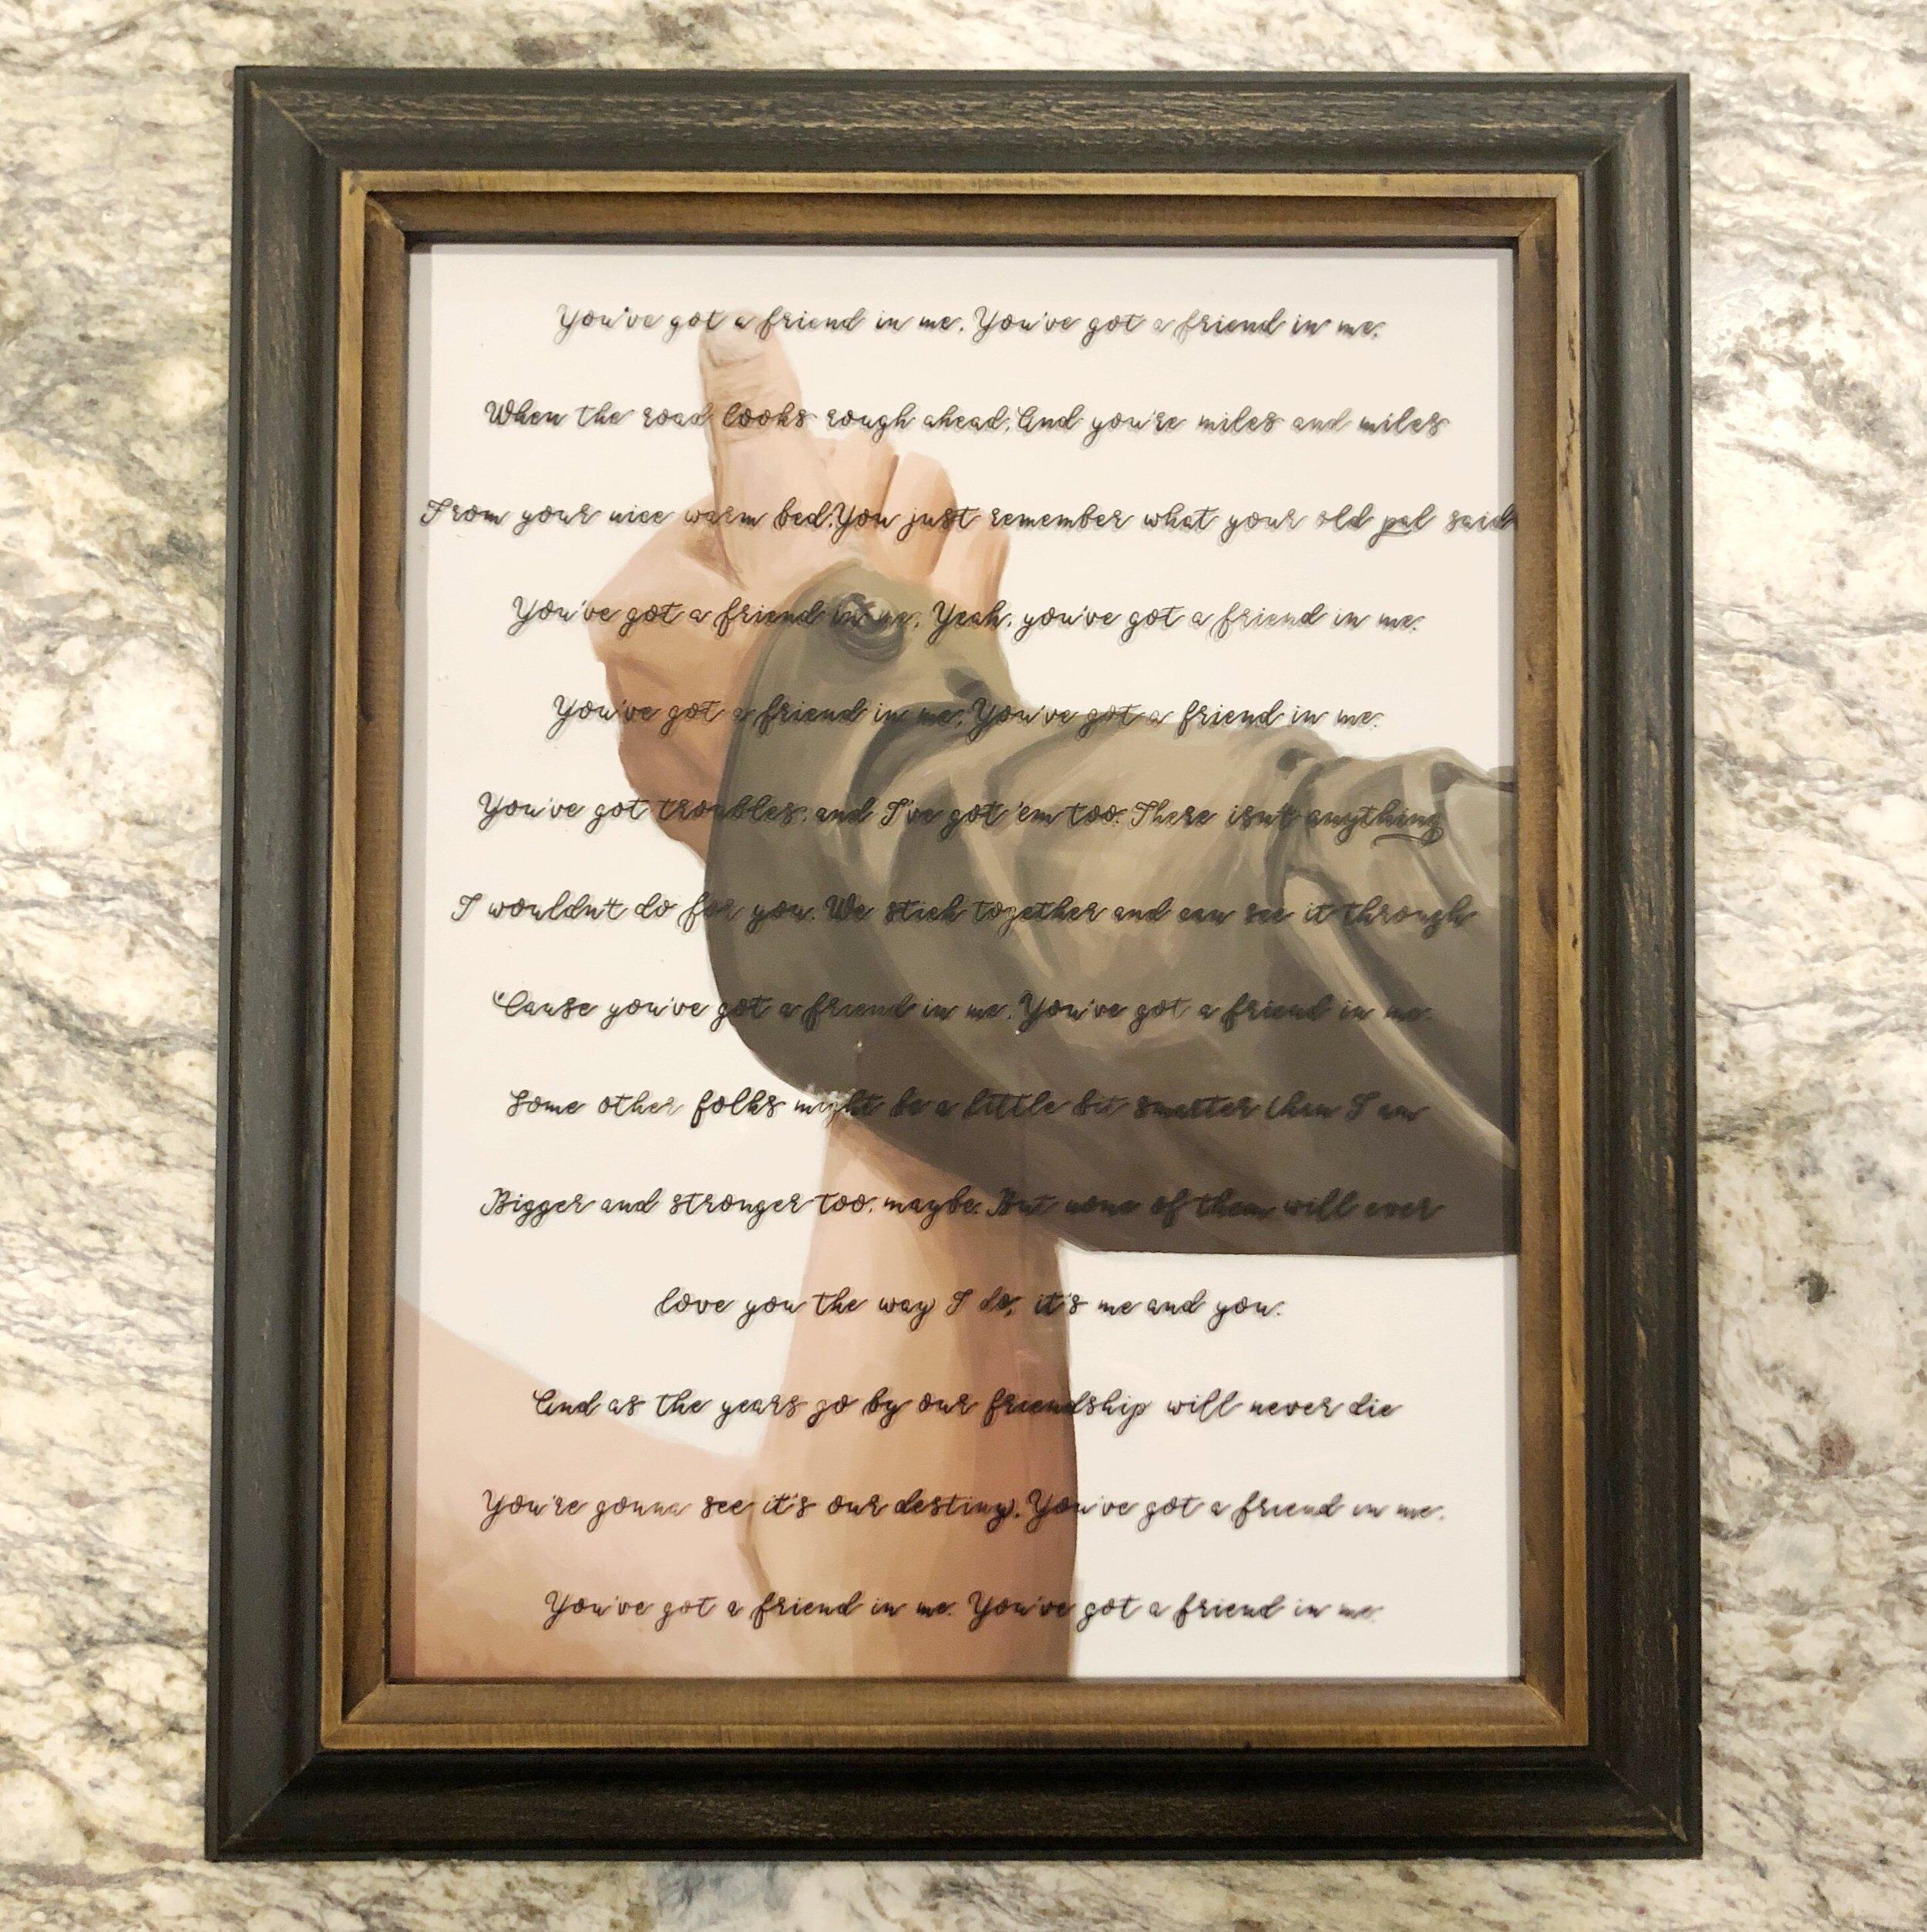 Central PA, York PA, JesSmith Designs, custom, wedding, invitations, bridal, announcements, save the date, baby, hanover, calligraphy, baltimore, wedding invitations, lancaster, gettysburg-04-05 20.53.49.jpg